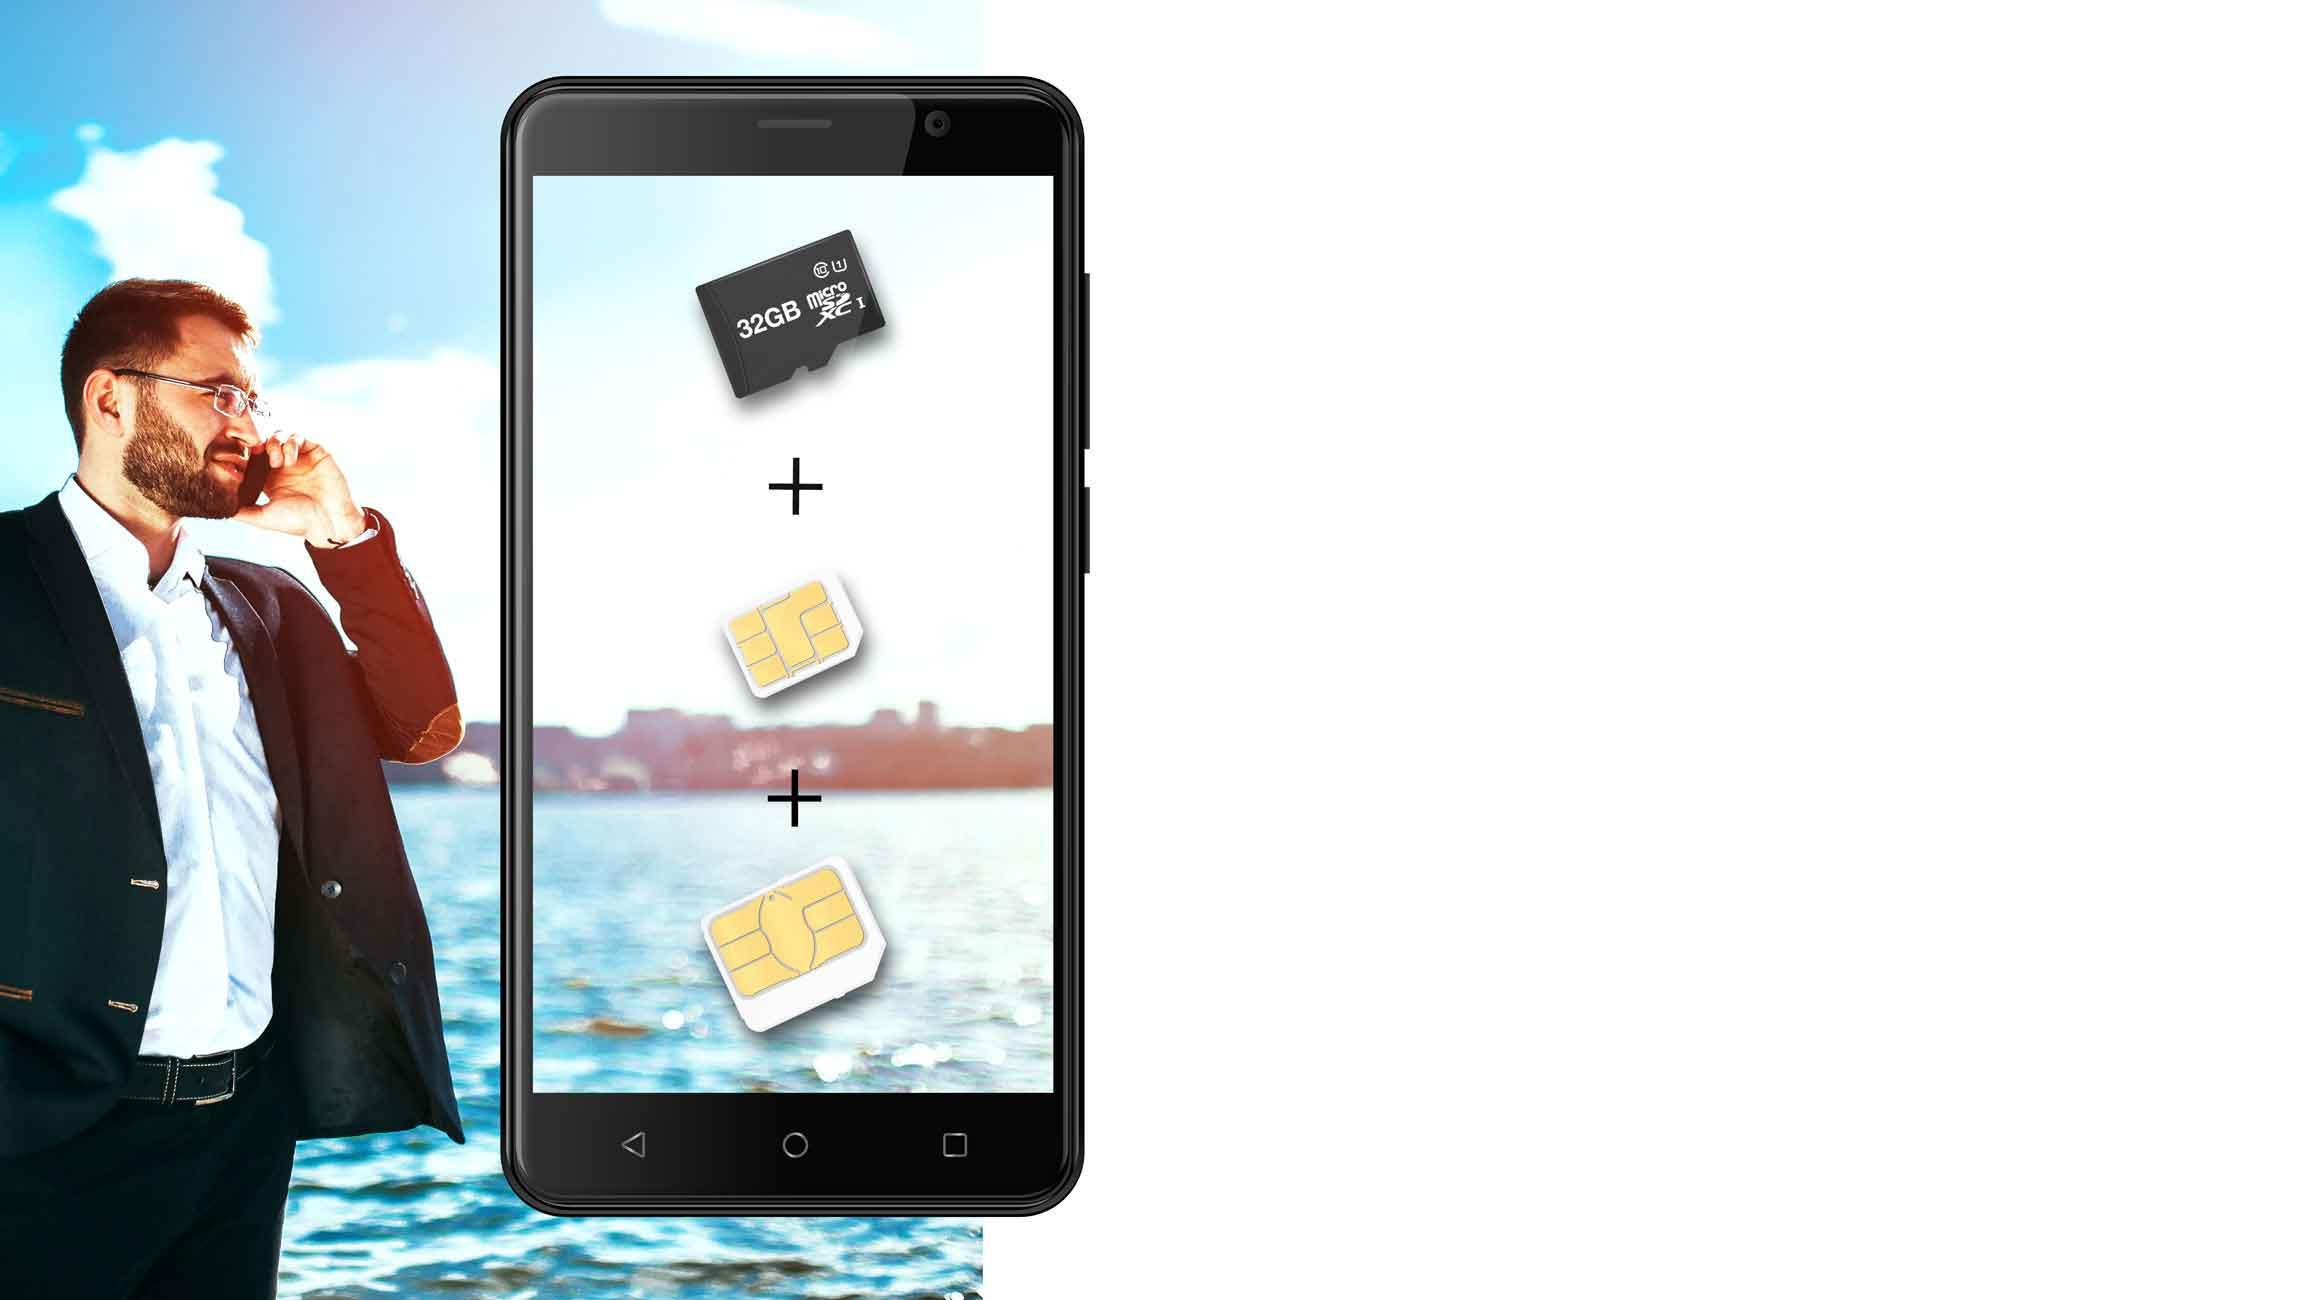 AT E500S sim - گوشی موبایل انرجایزر مدل Energizer Energy E500S با ظرفیت ۸ گیگابایت